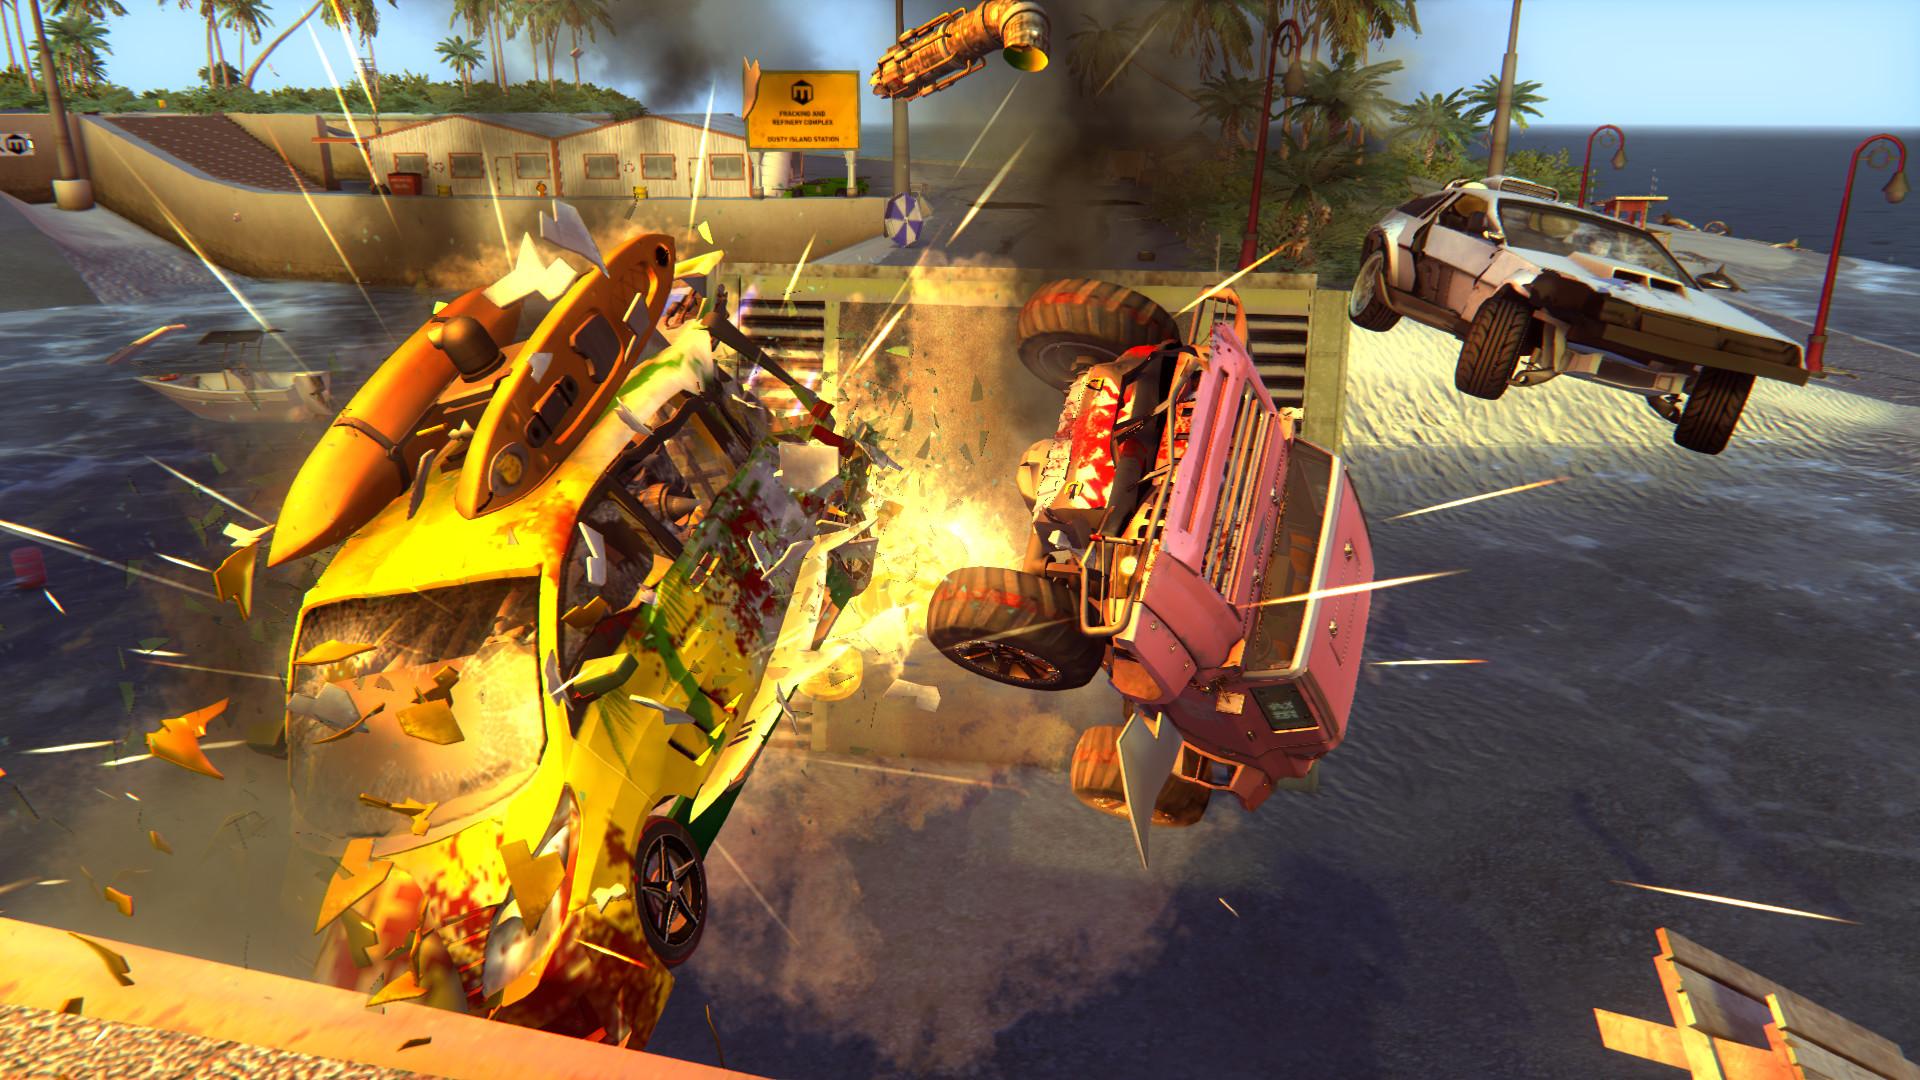 Classic car-combat returns to rip it up in Carmageddon